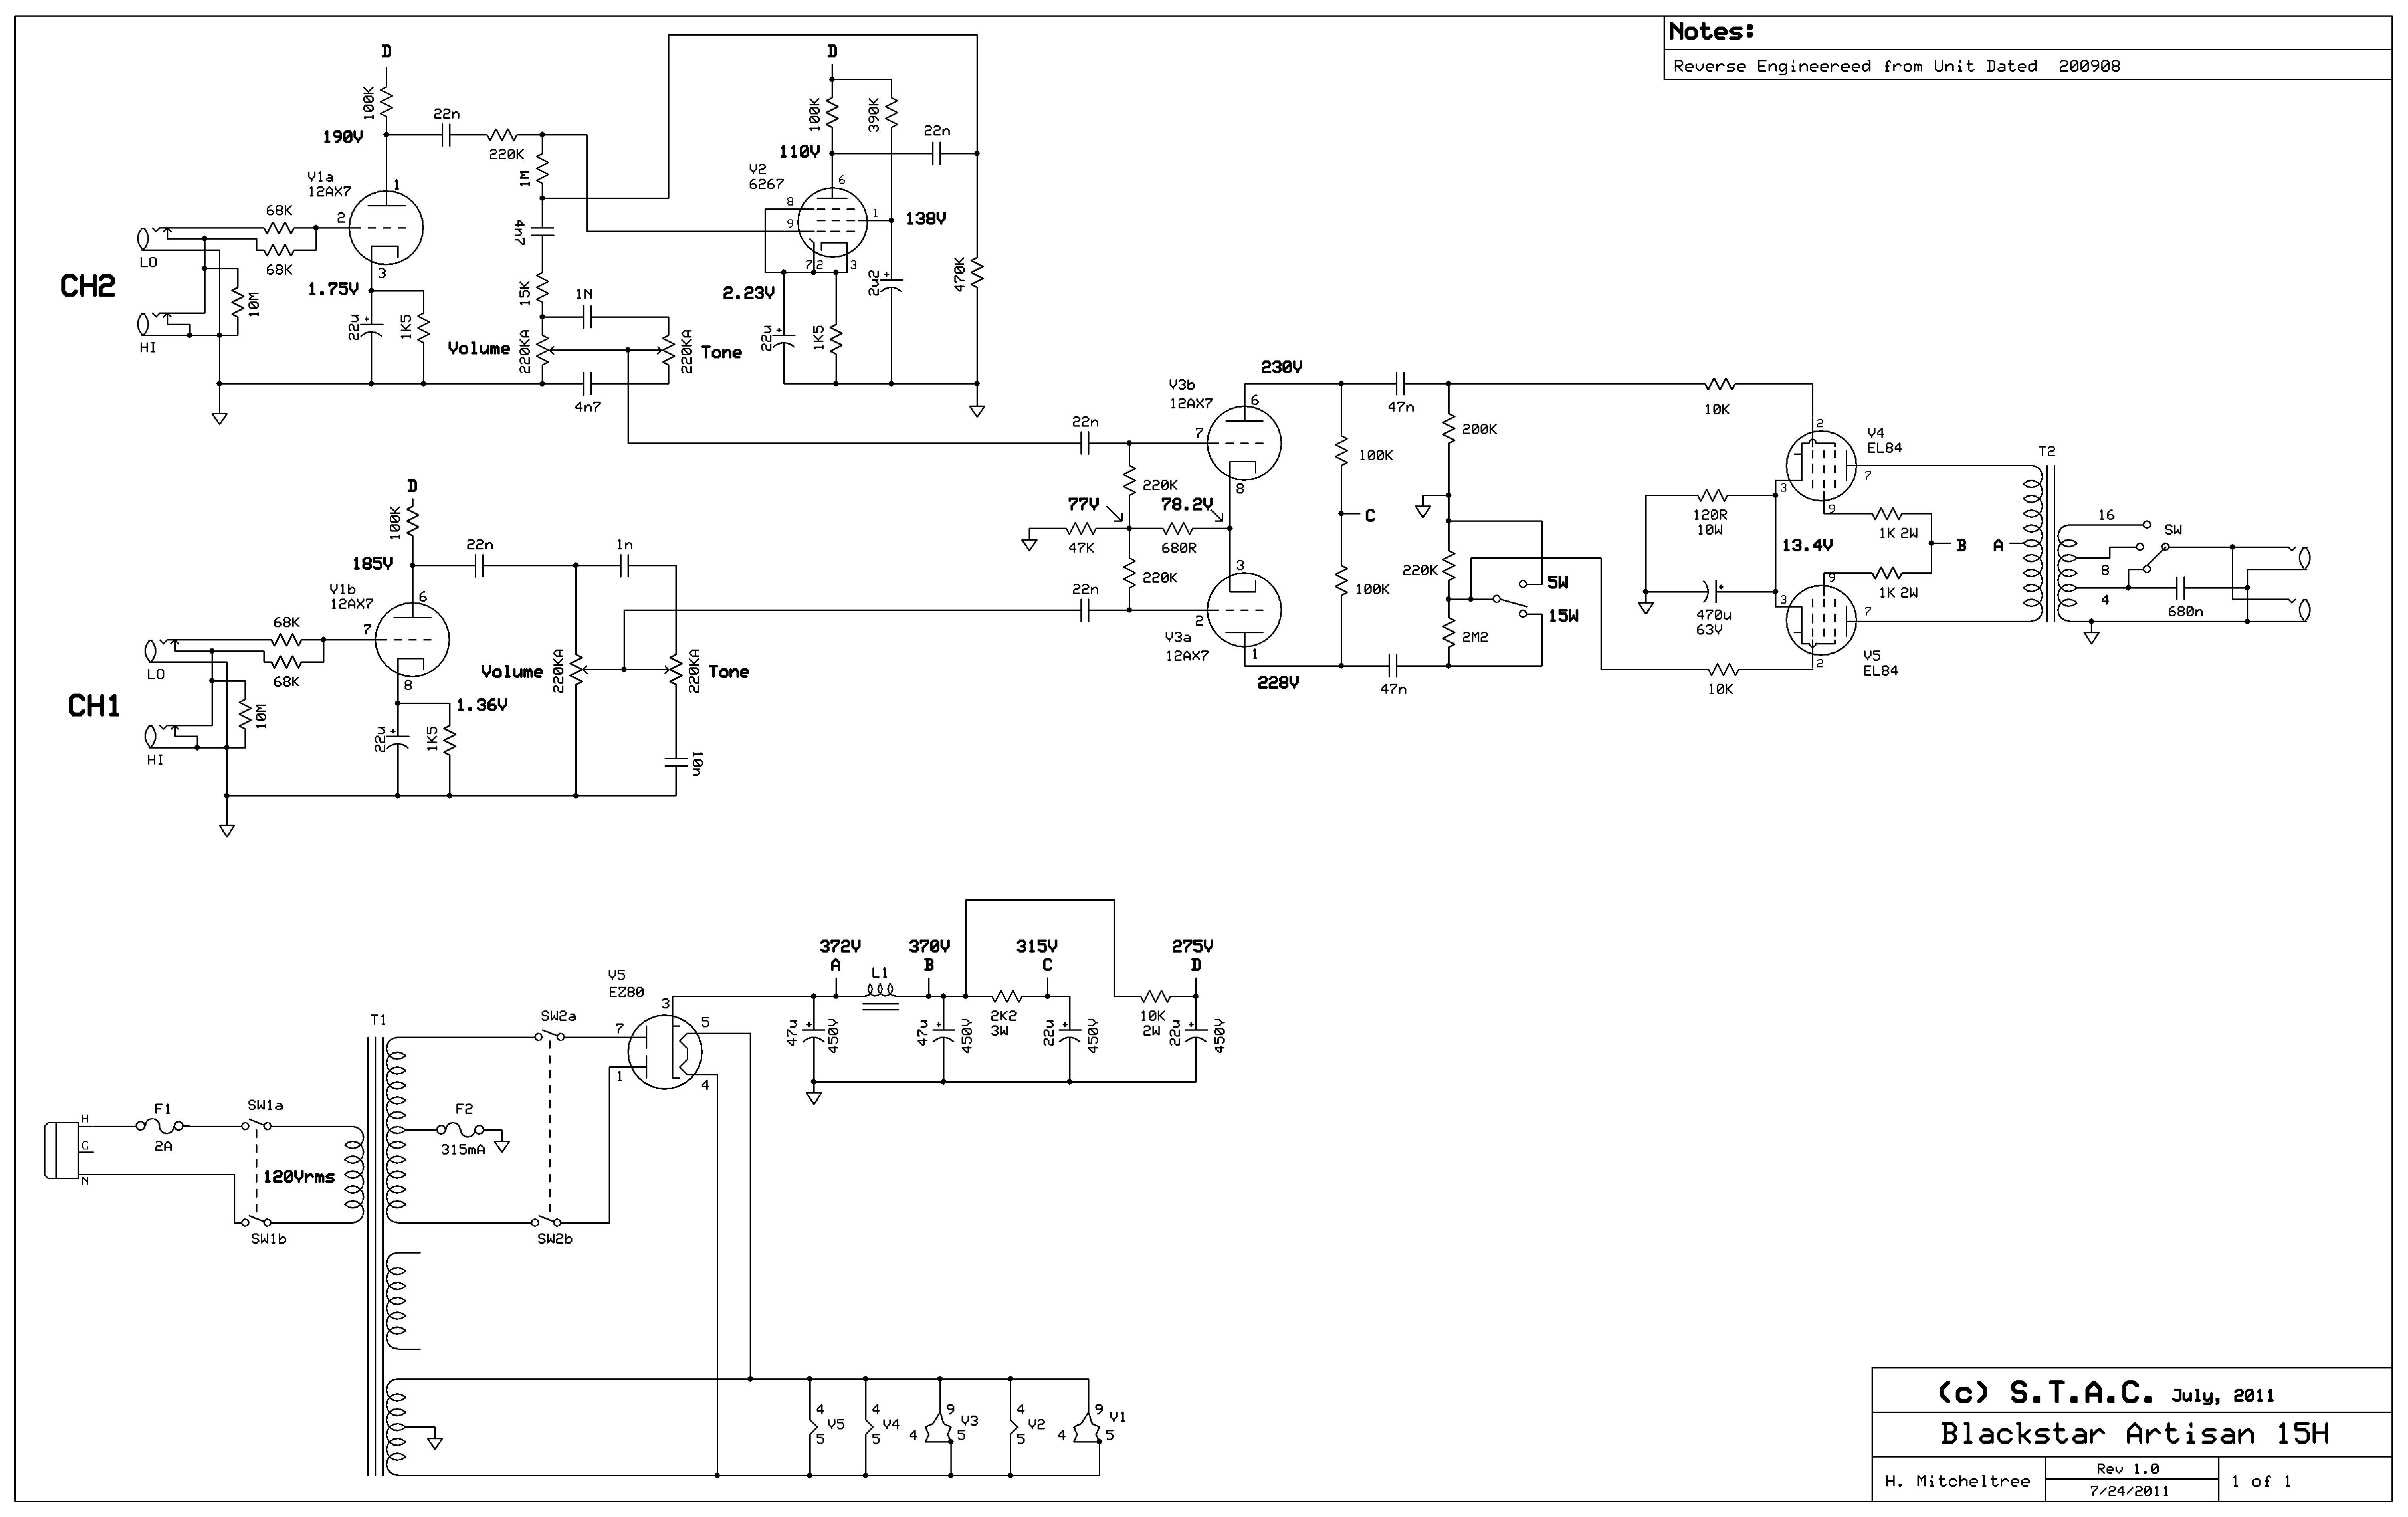 artisan wiring diagram wiring diagram general helper hibiscus corolla diagram 73b skoda octavia 2007 wiring diagram